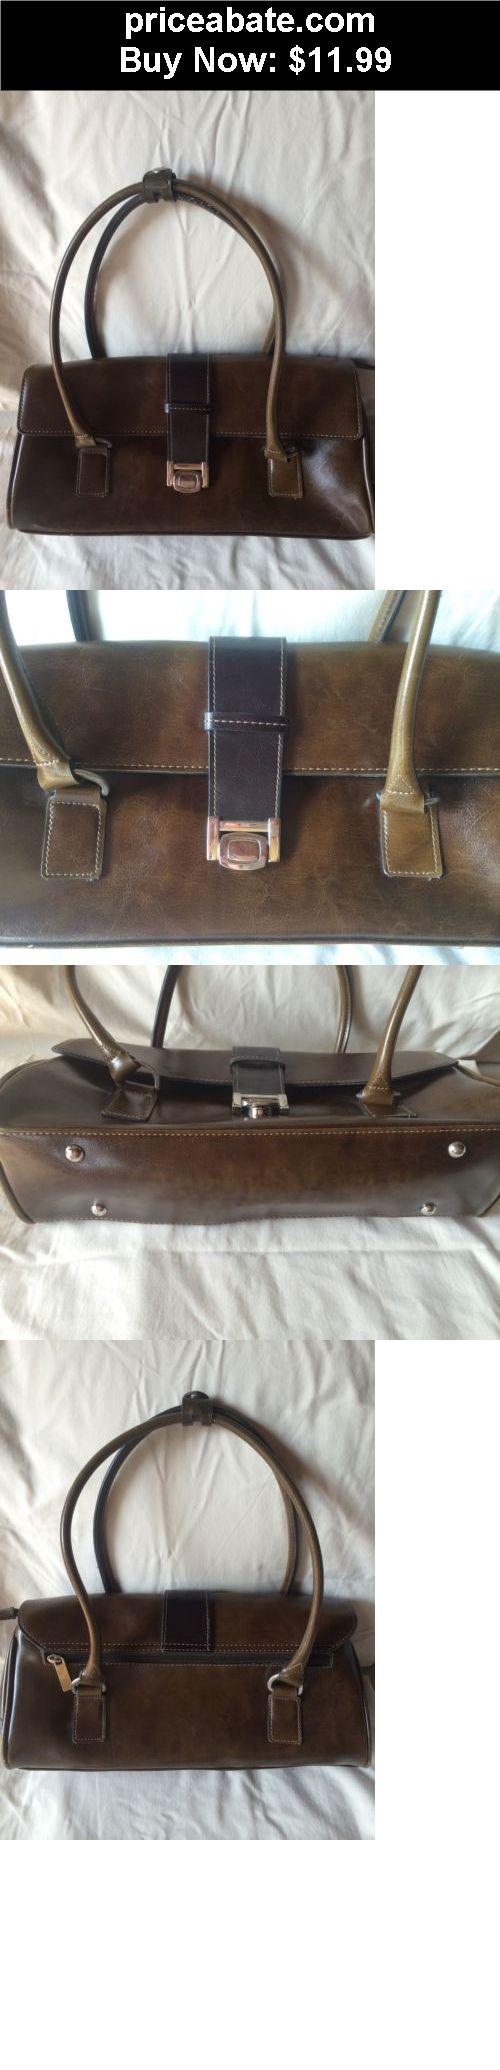 Women-Handbags-and-Purses: Vintage Brown Leather Satchel Syle  Tote Shoulder Bag Purse Handbag - BUY IT NOW ONLY $11.99